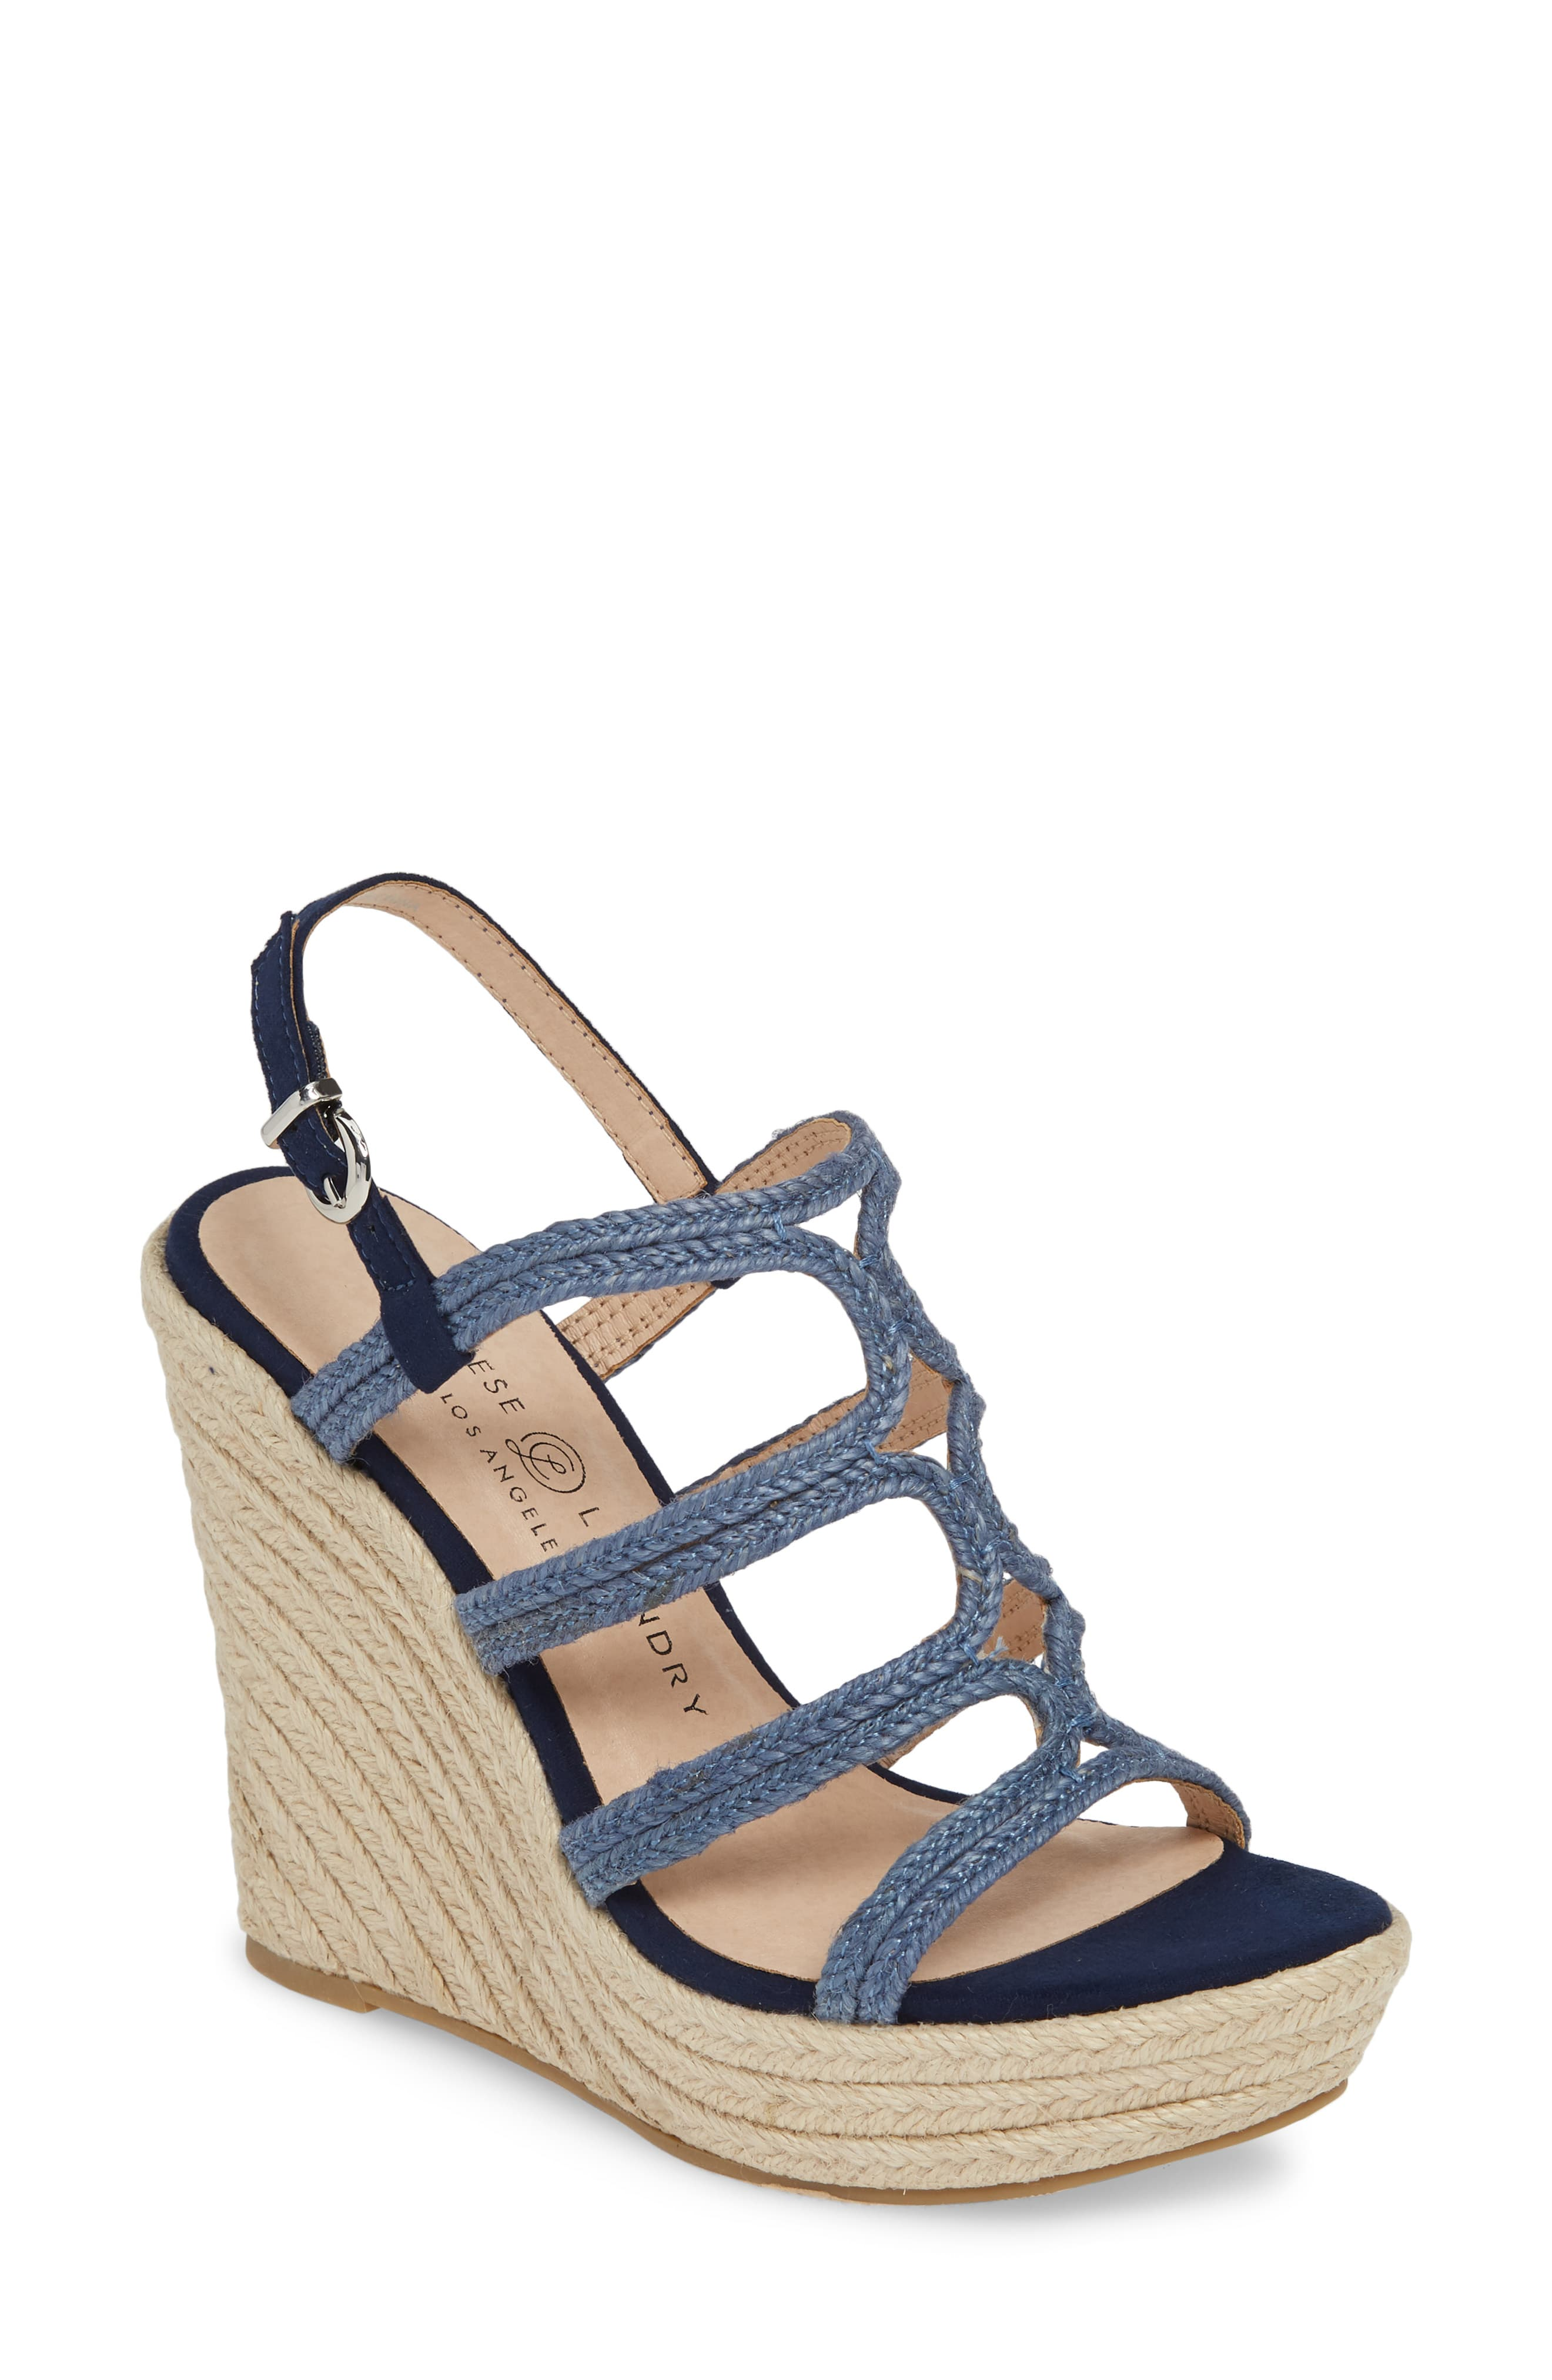 Chinese Laundry Milla Platform Wedge Sandal Women Platform